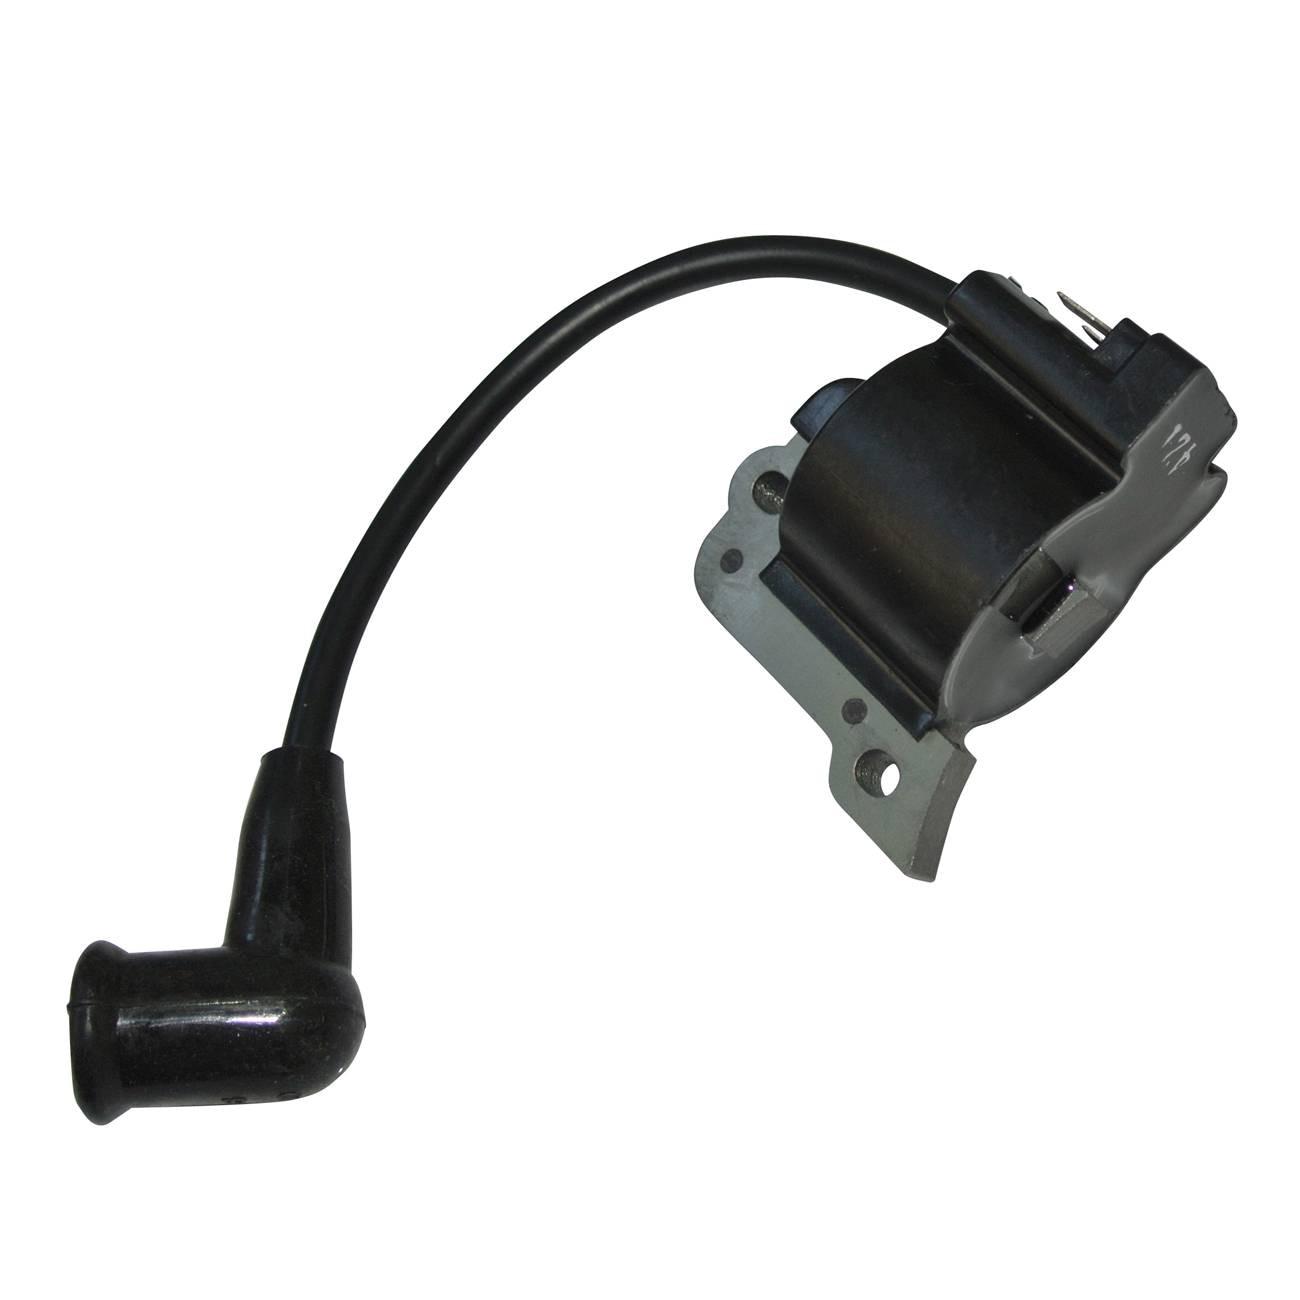 Ignition Coil Assy Fit SL750 SLP600 Brush Cutter Grass Trimmer Engine Part New